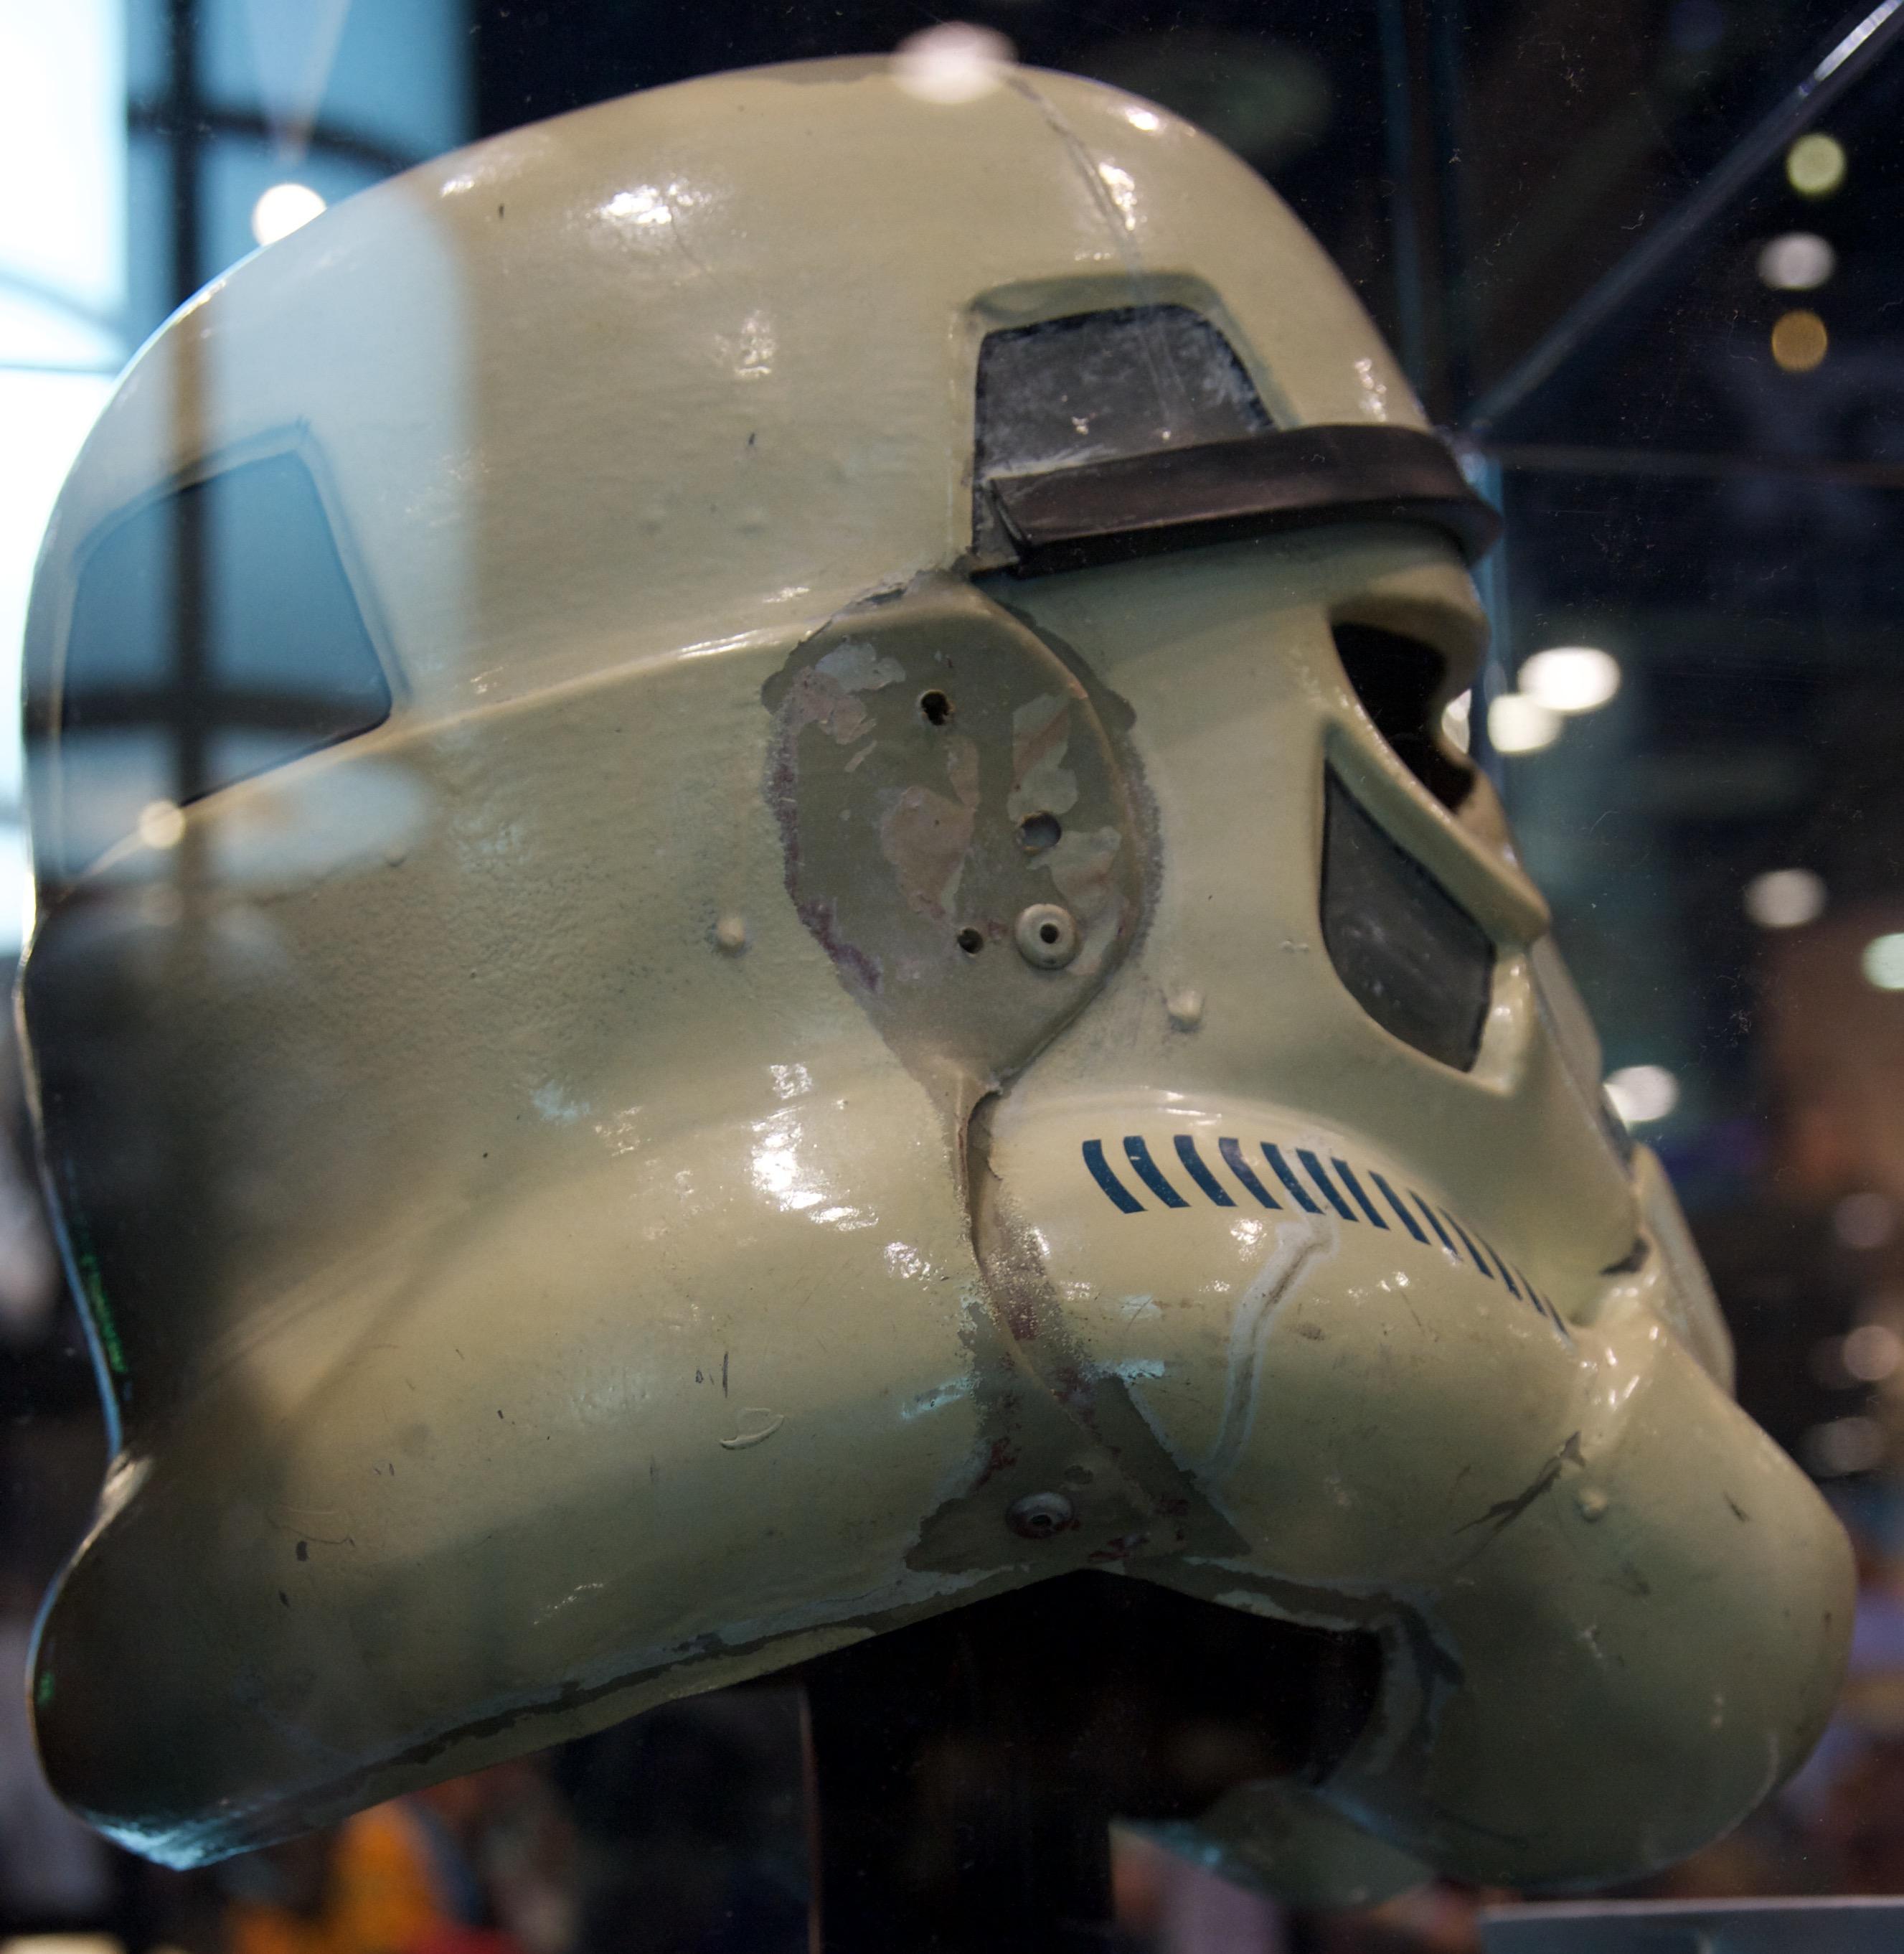 stop_that_ship_helmet_06.jpg